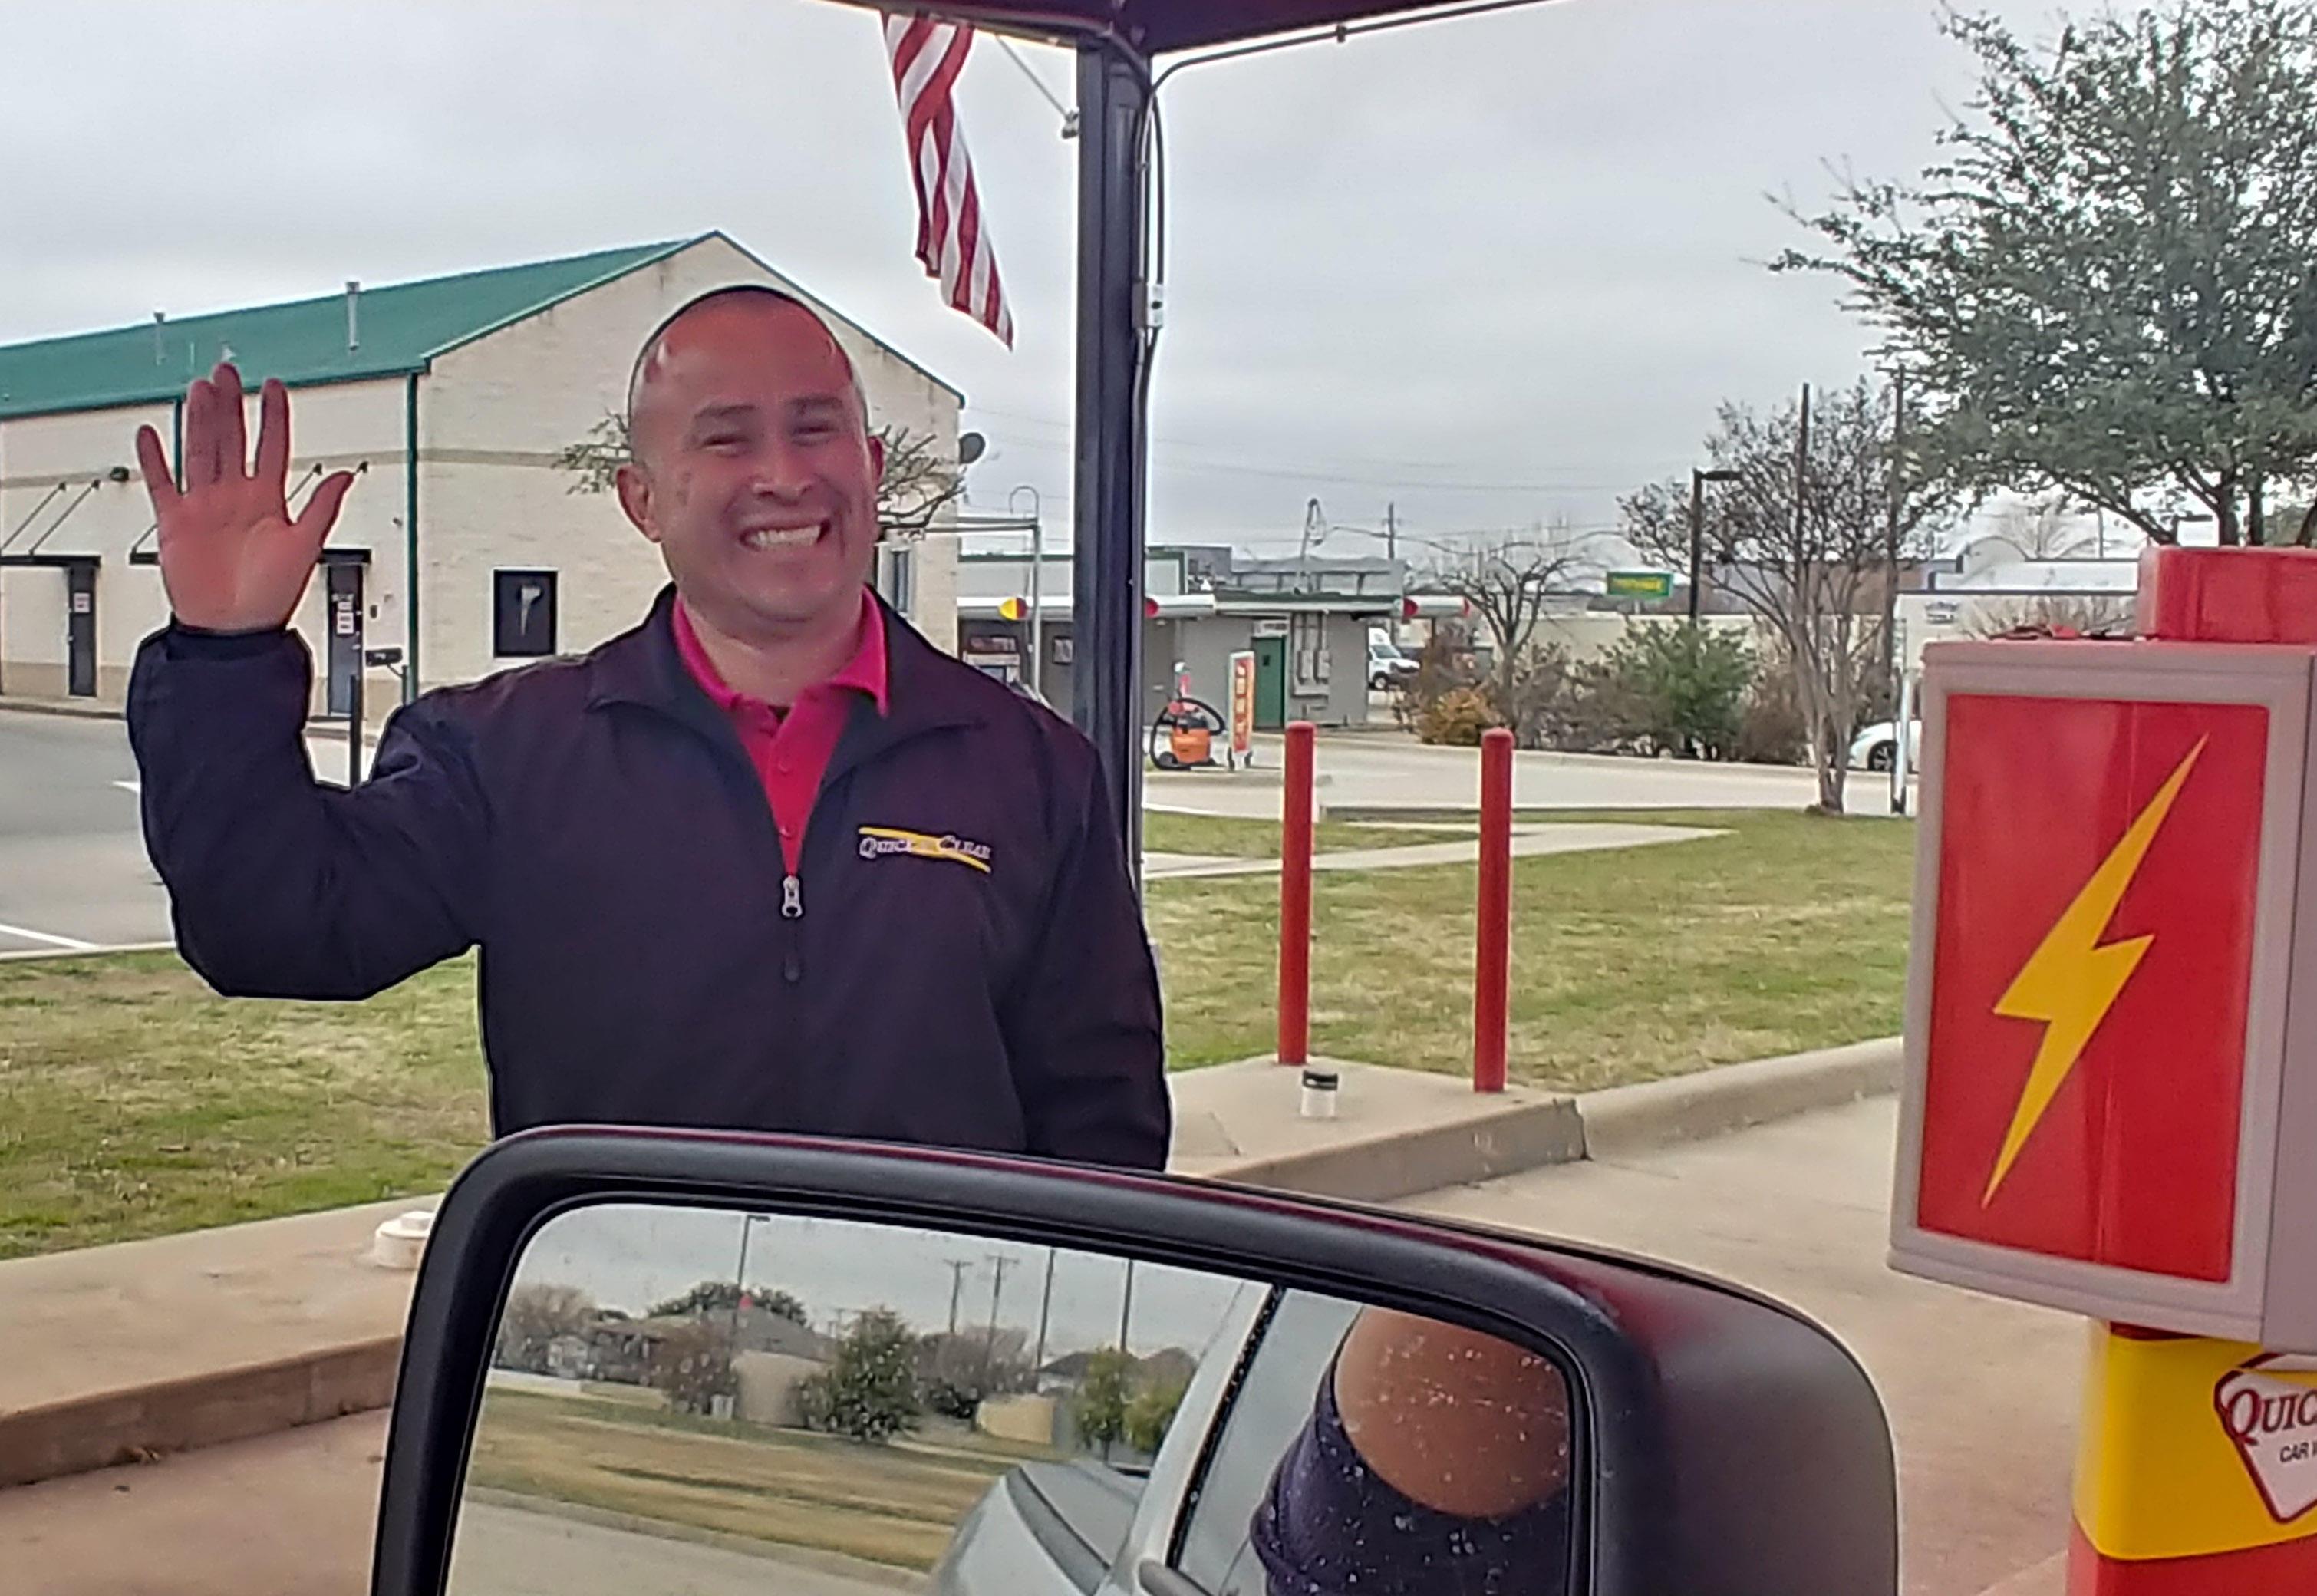 Quick N Clean Car Wash - ALLEN, TX - GRAND OPENING!